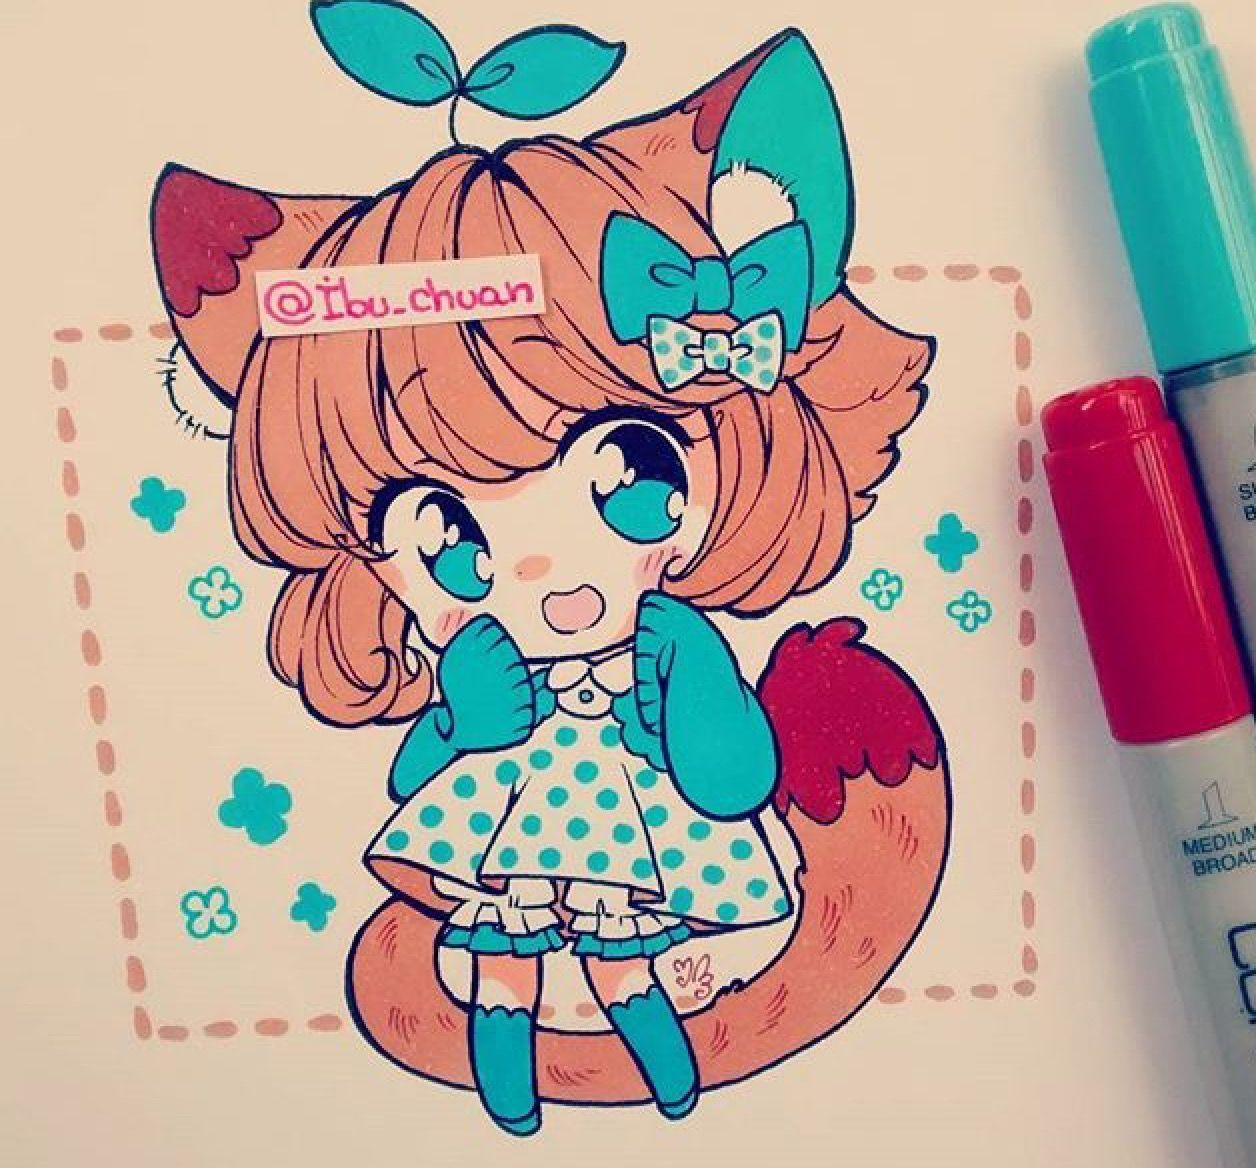 ibu_chuan [Instagram] | Cute chibis | Pinterest | Chibi, Instagram ...